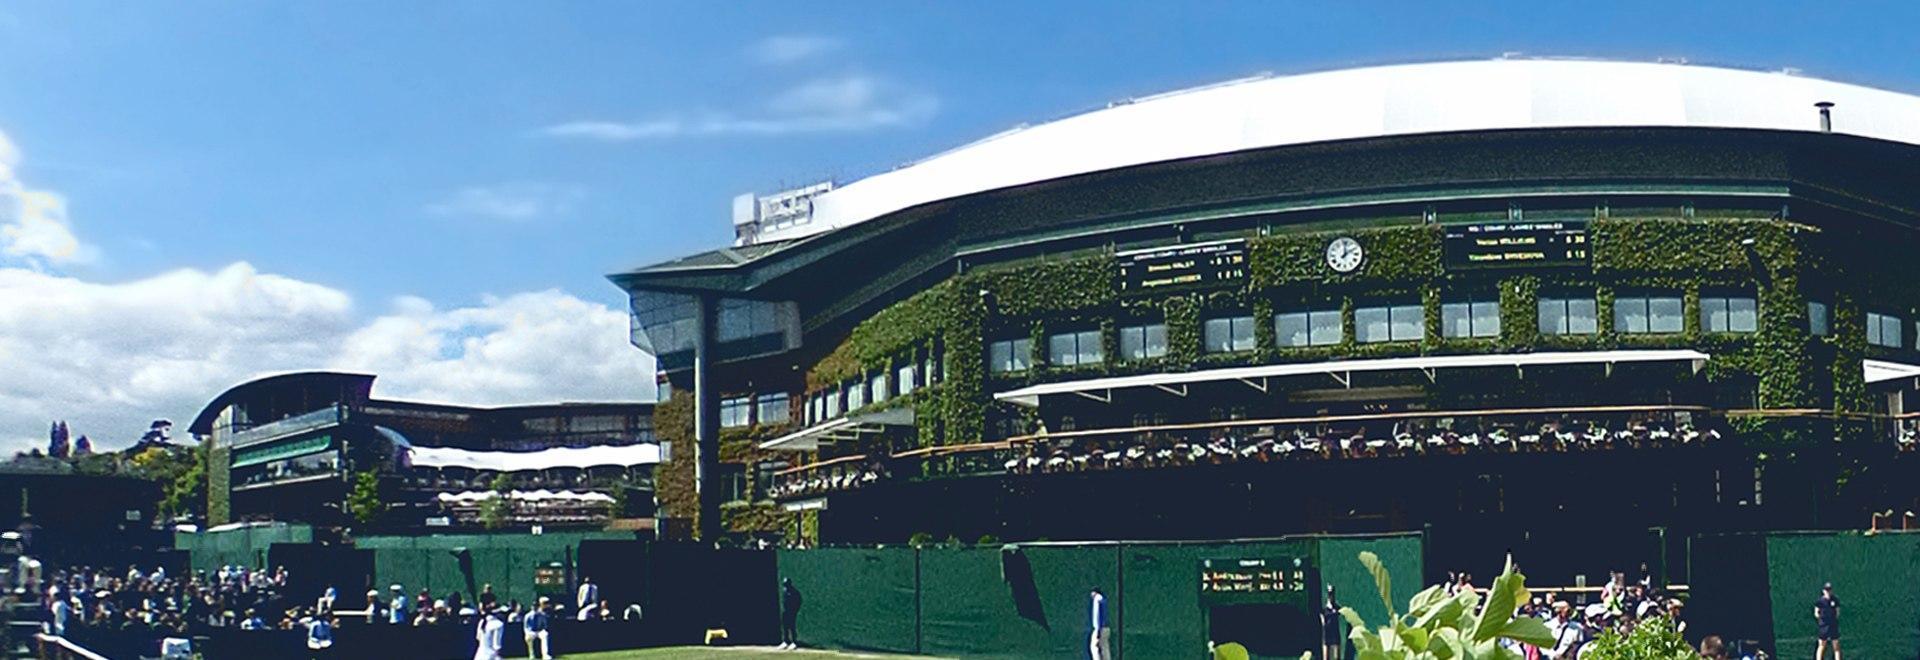 Wimbledon 2019: Djokovic - Federer. Finale M